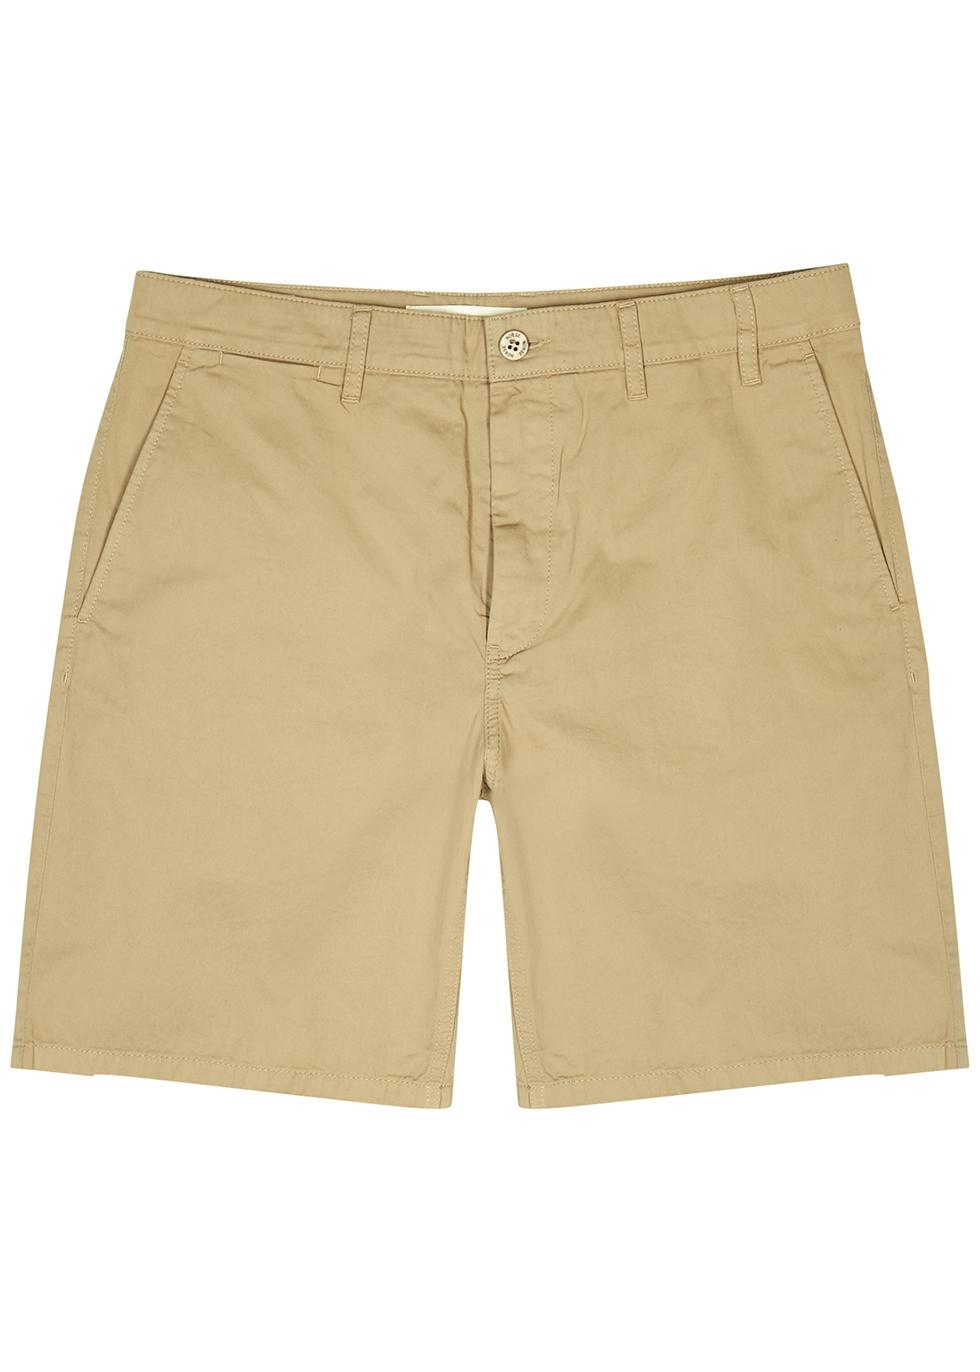 Aros sand twill shorts